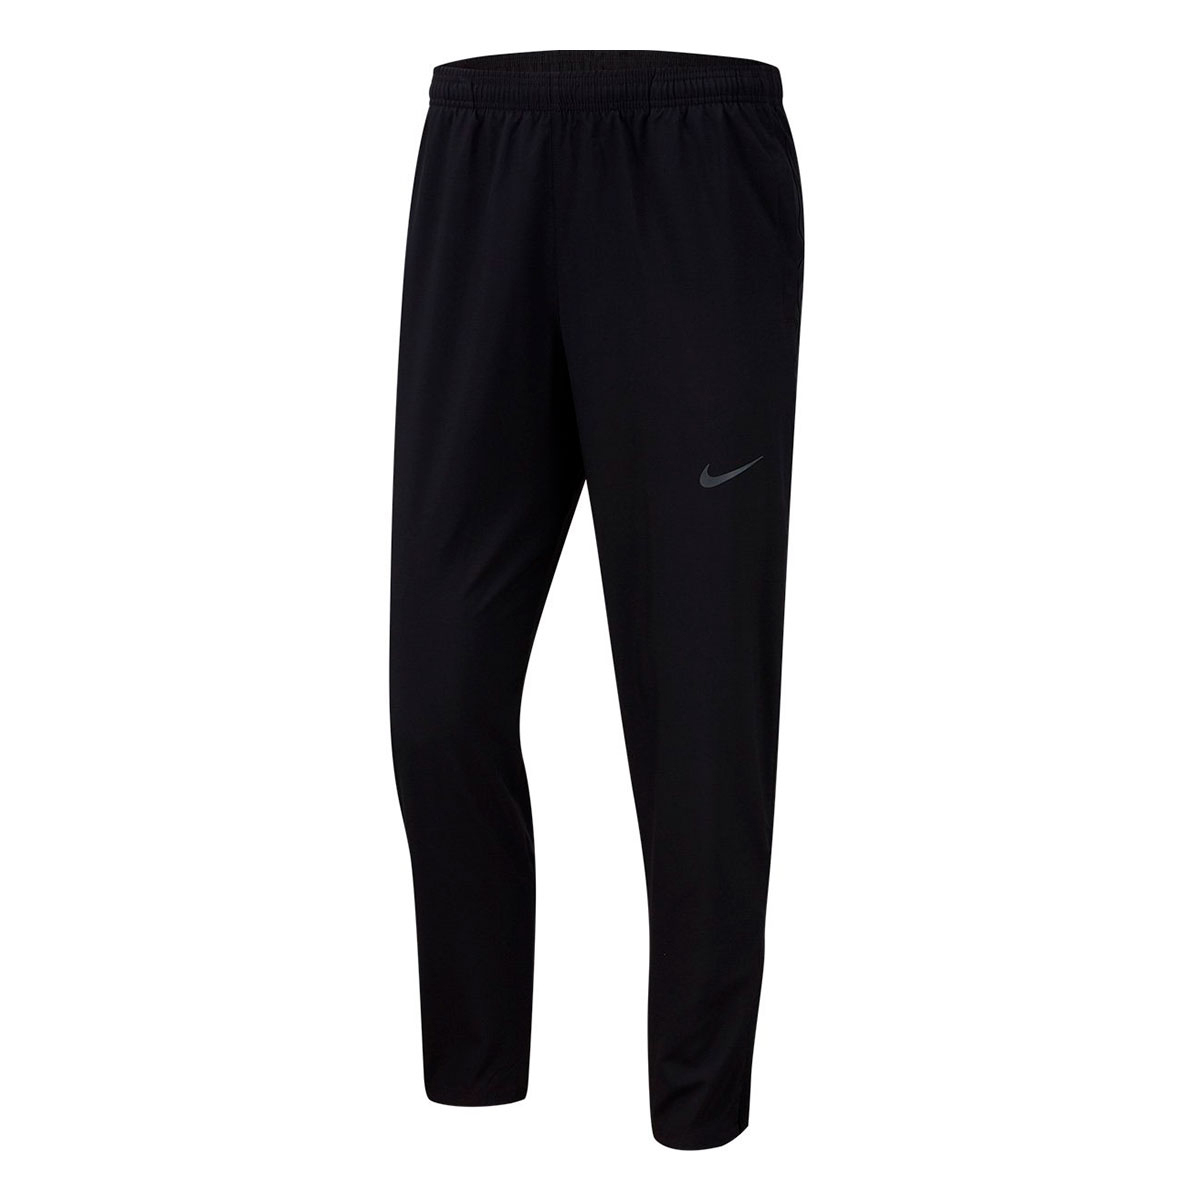 Calça Nike Run Stripe Woven Preto